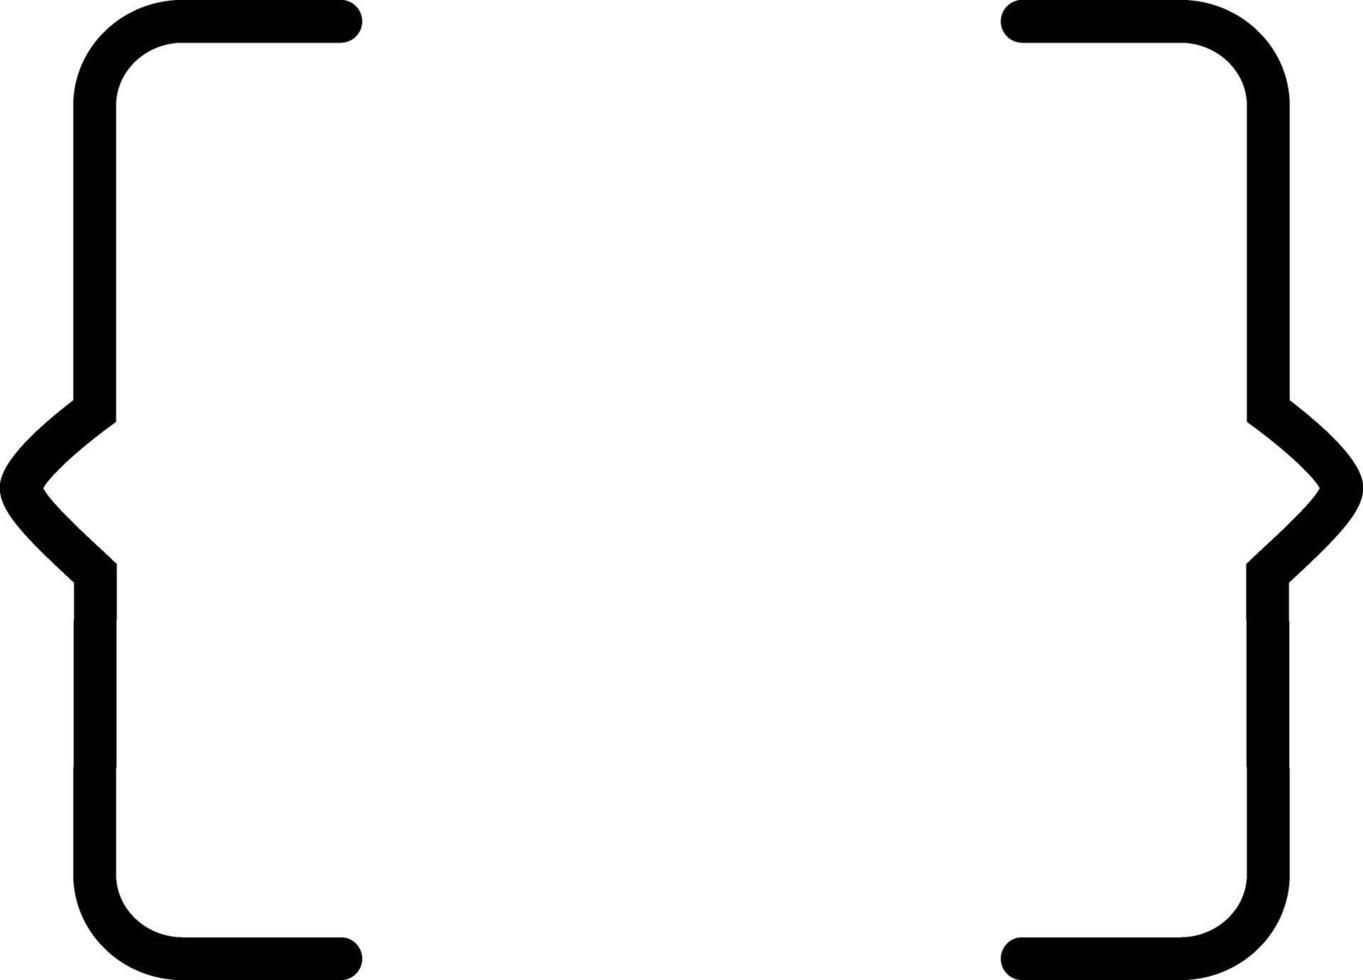 Liniensymbol für Klammern vektor